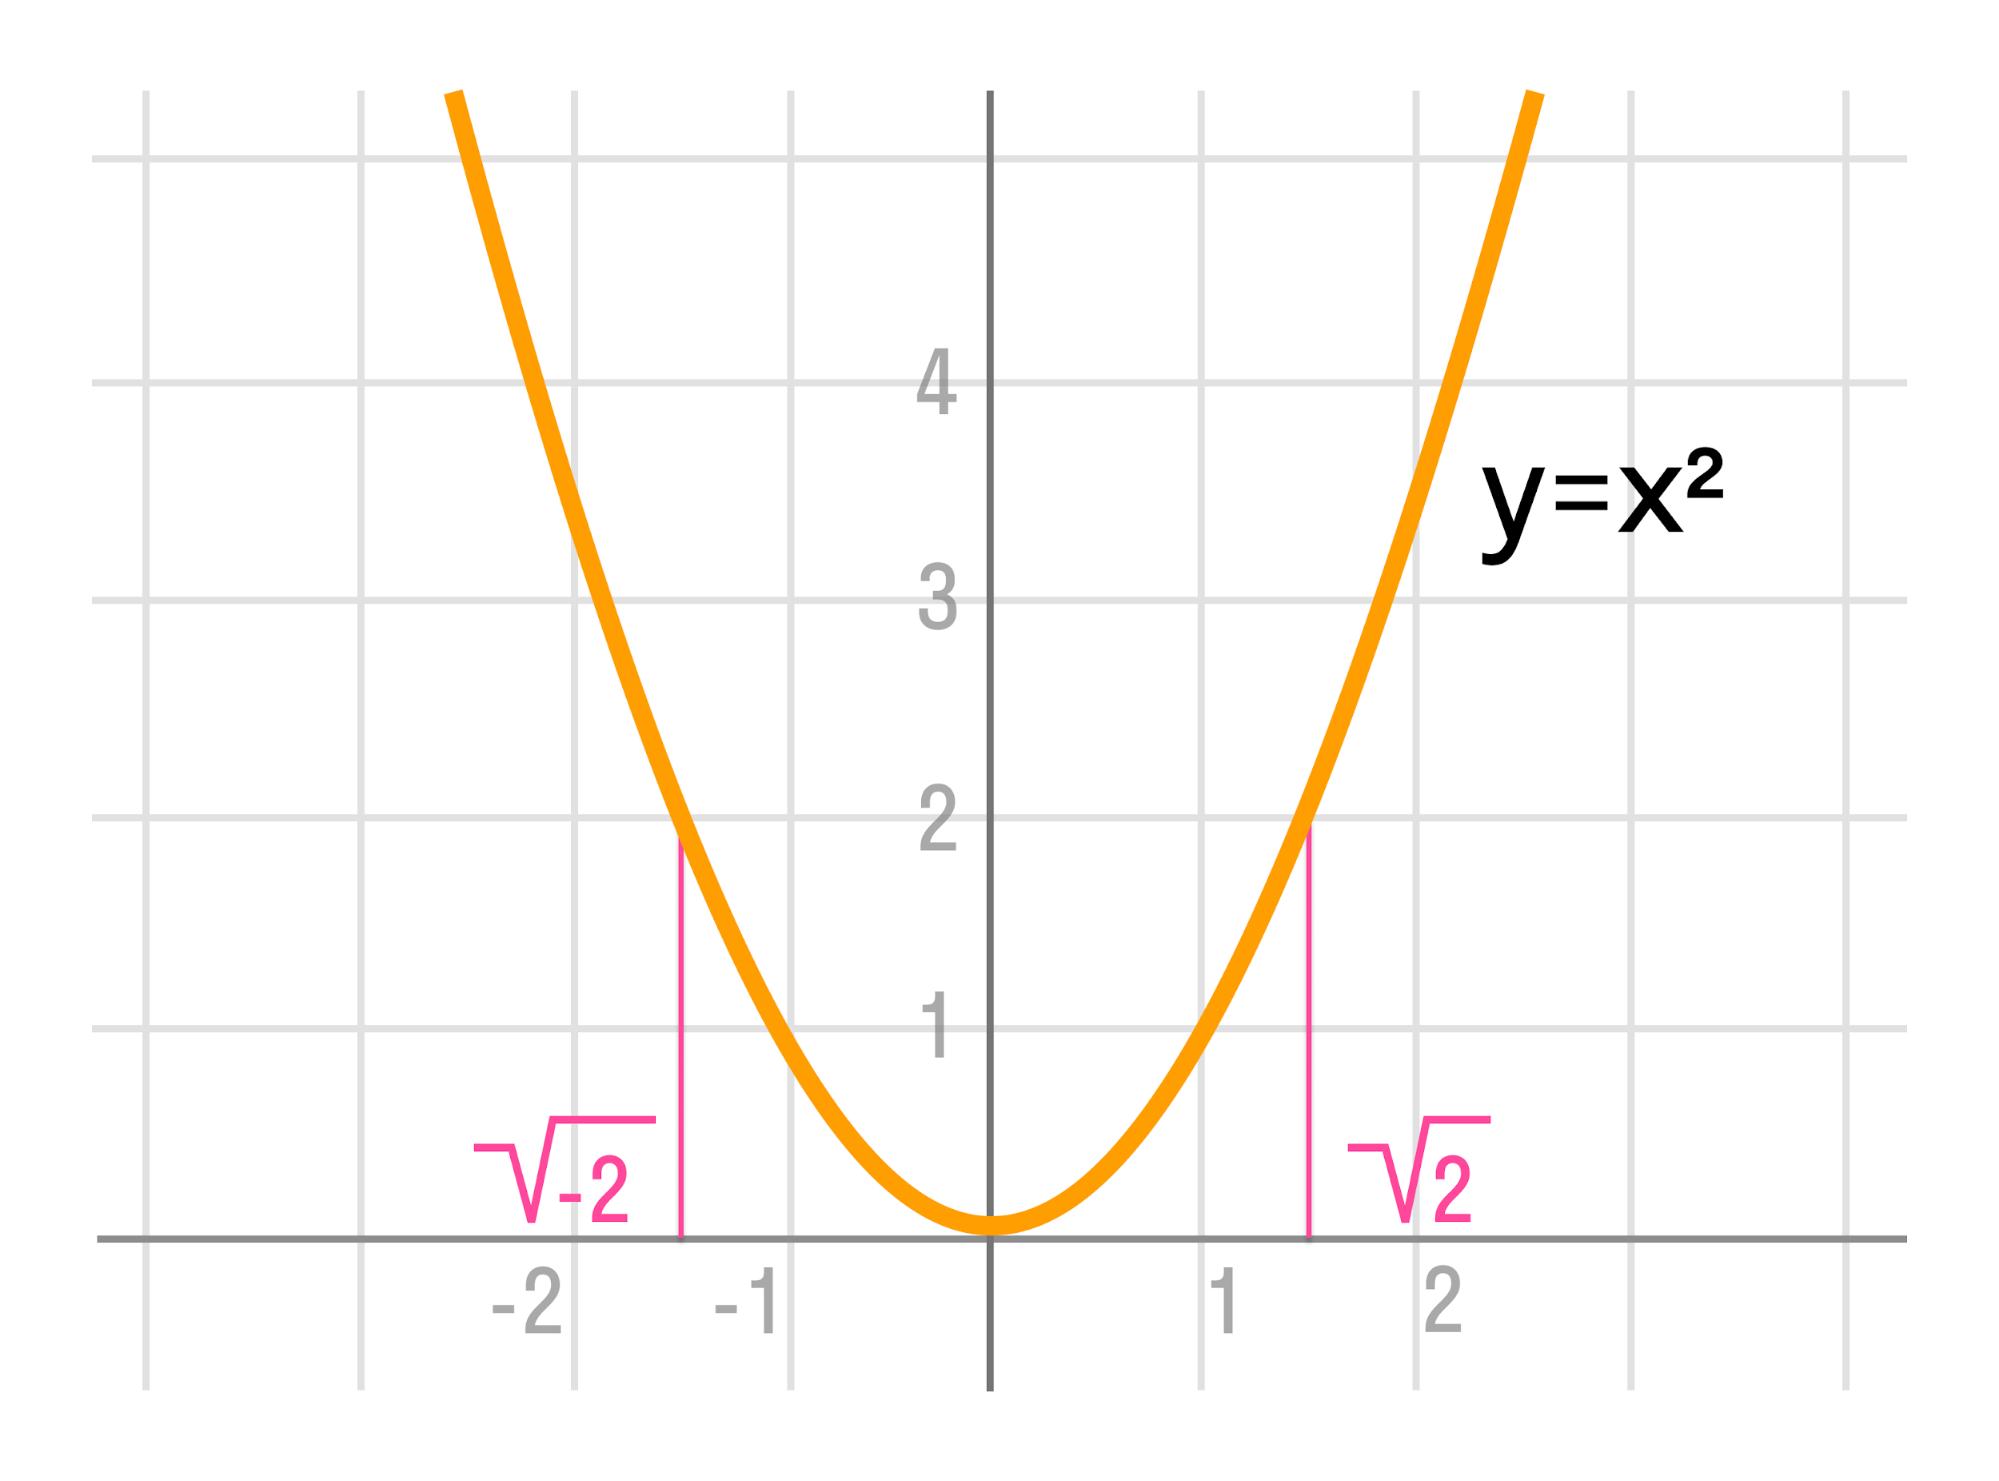 график функции y = x2